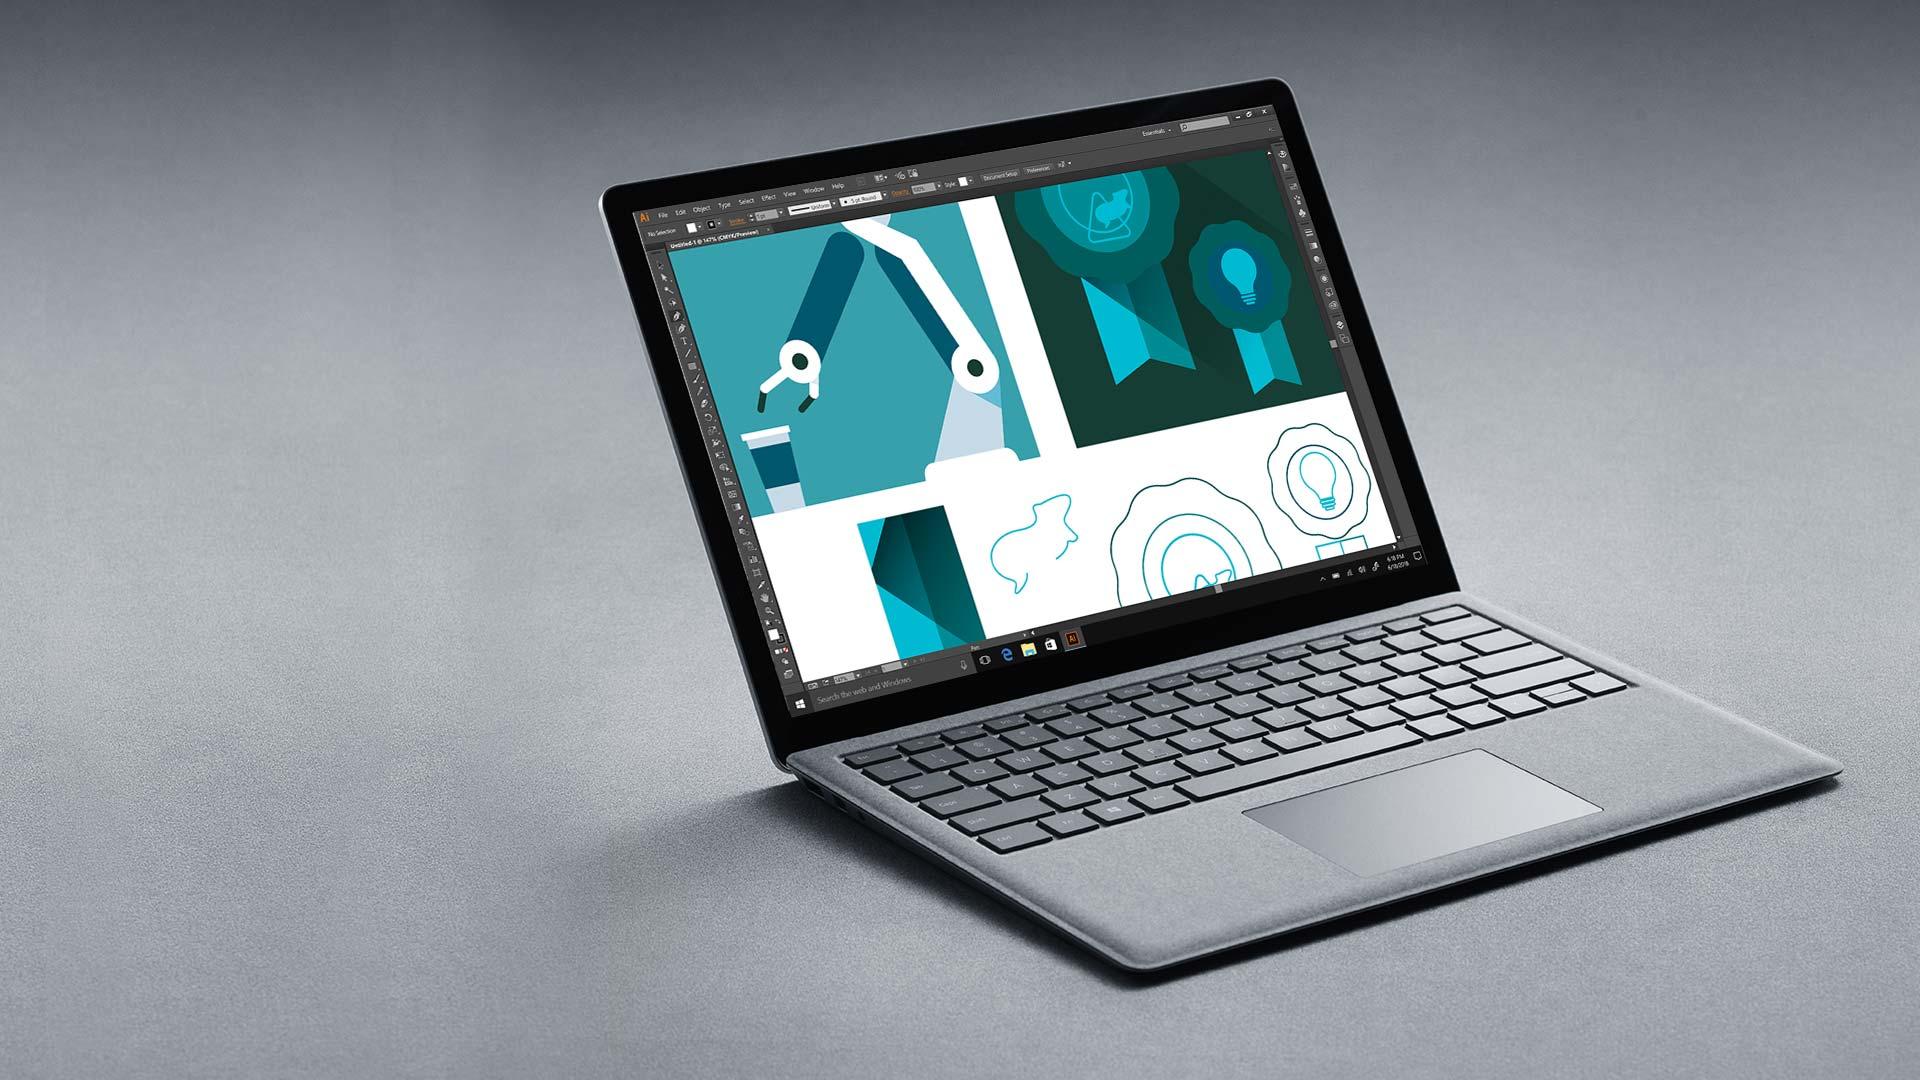 Platinum Surface Laptop with Adobe Illustrator screen.